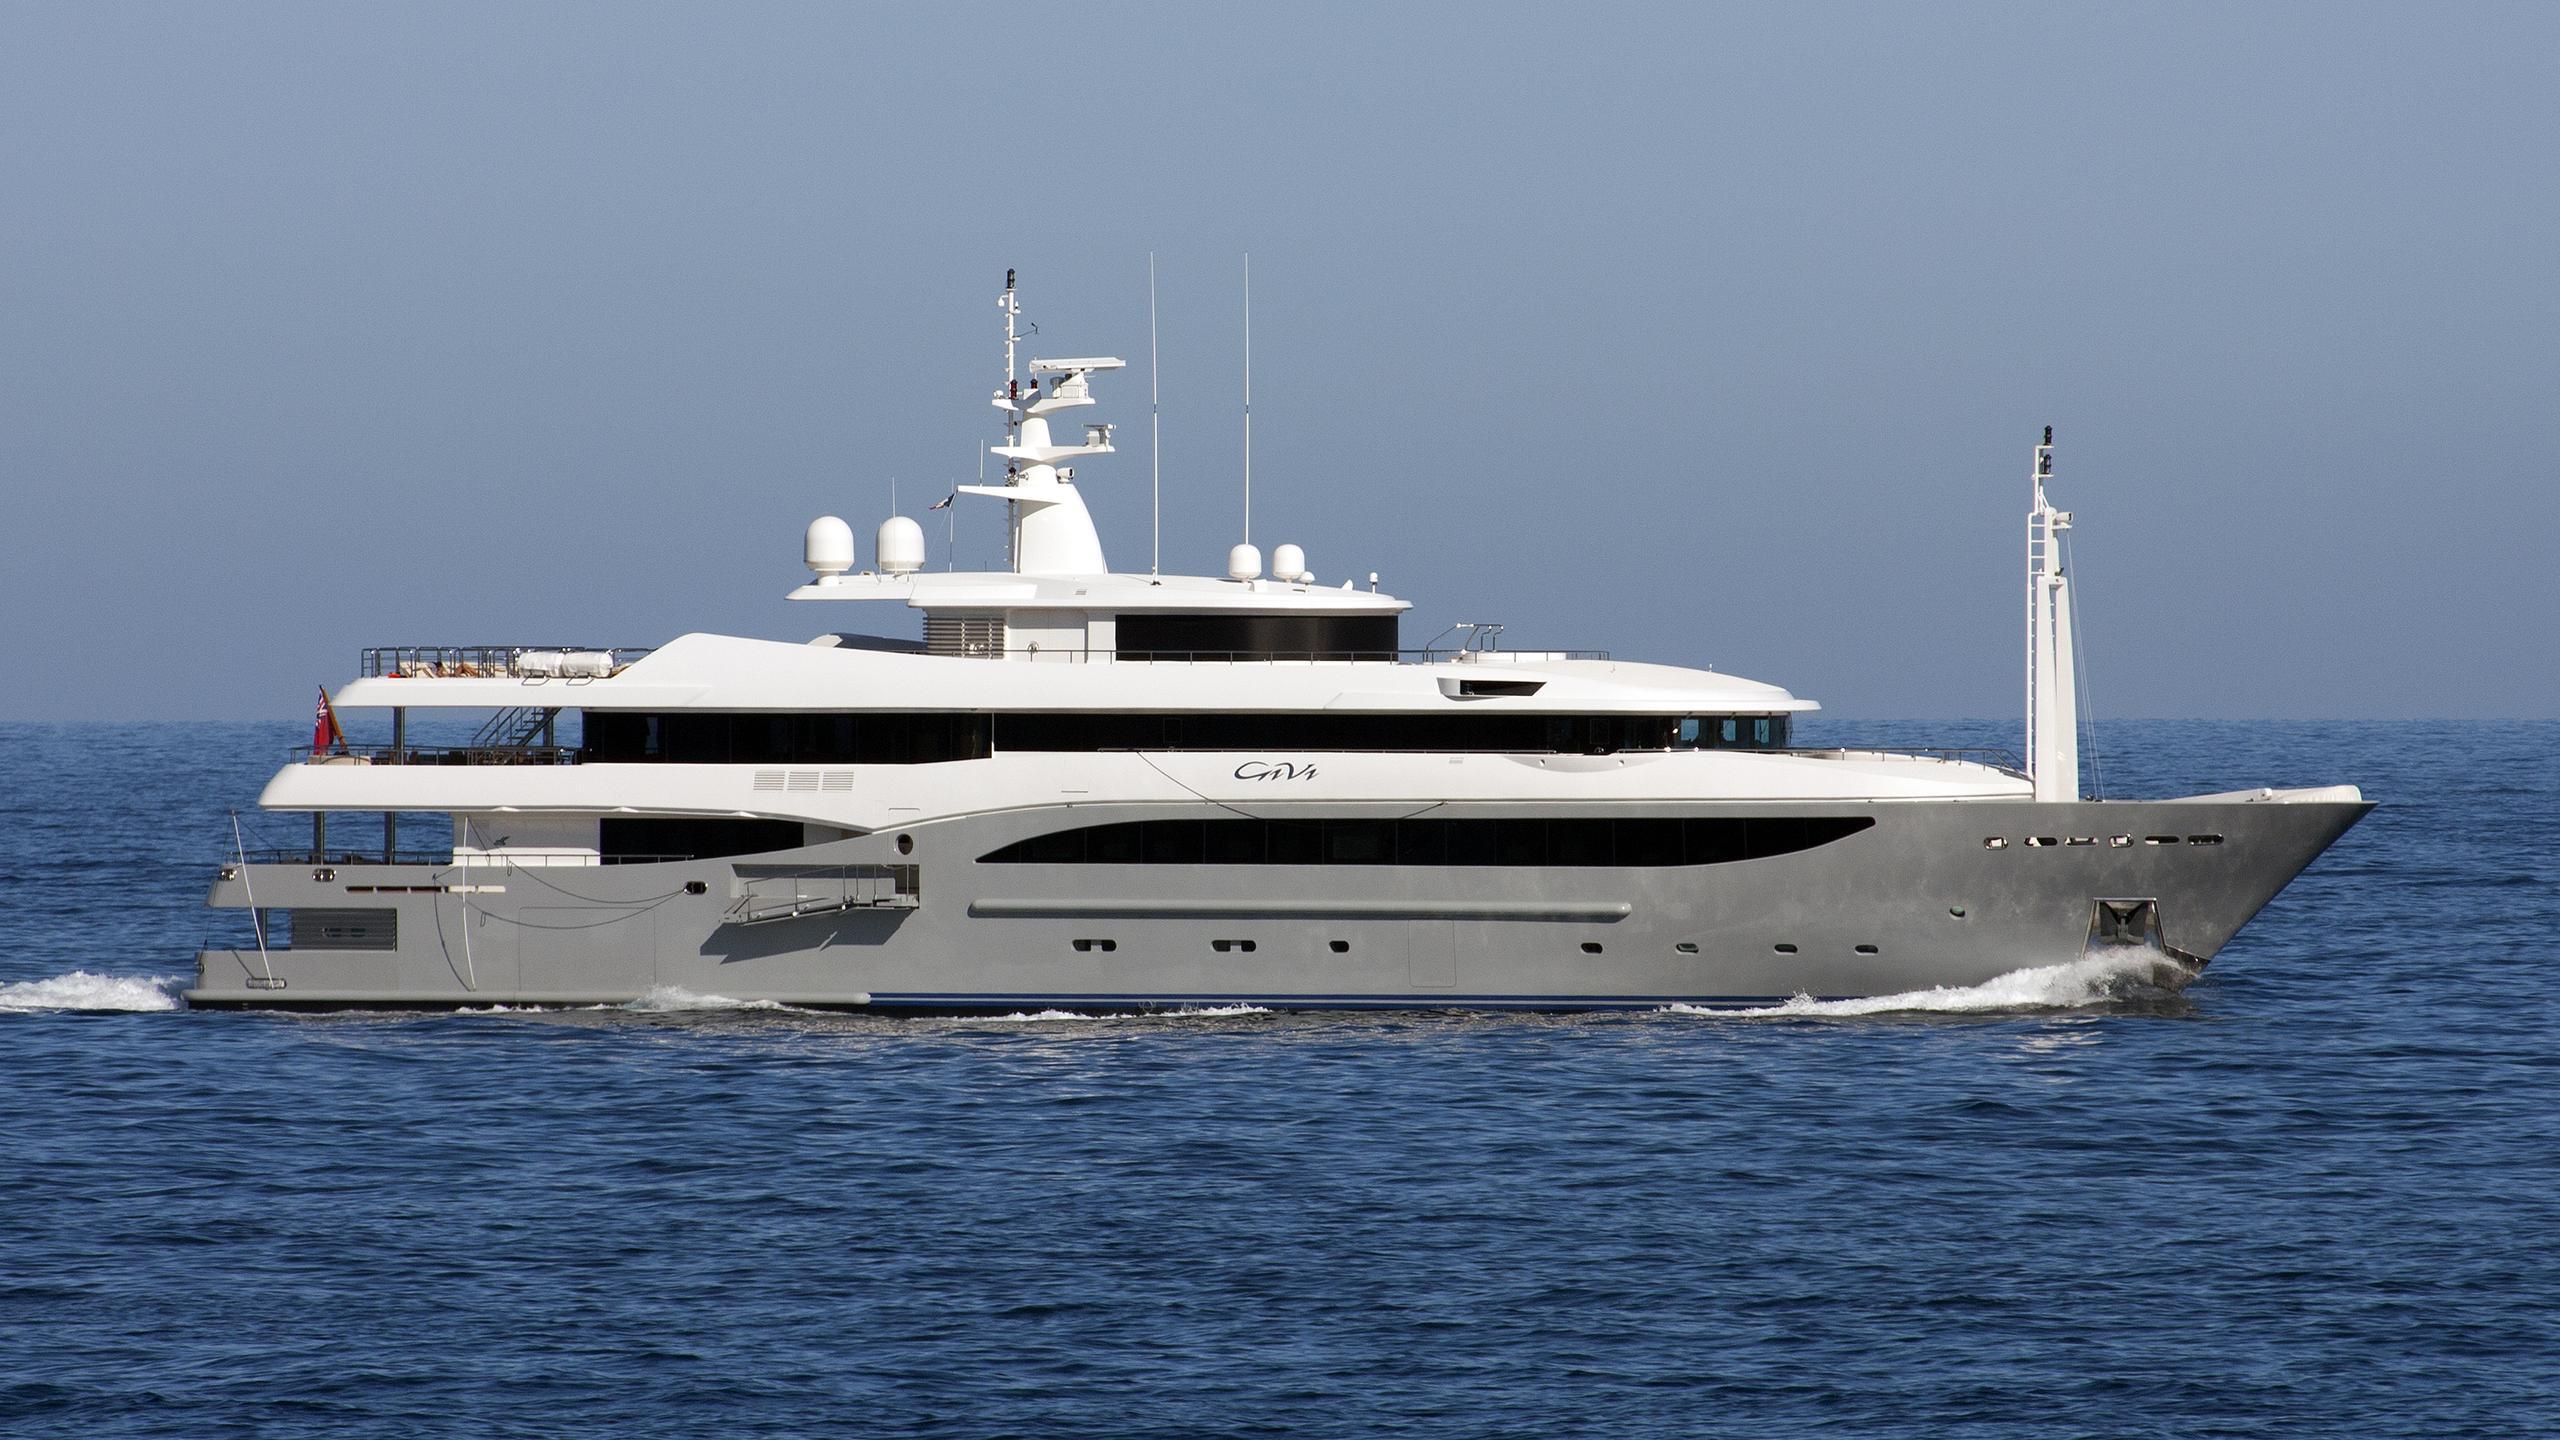 constance givi motoryacht crn 60m 2006 profile